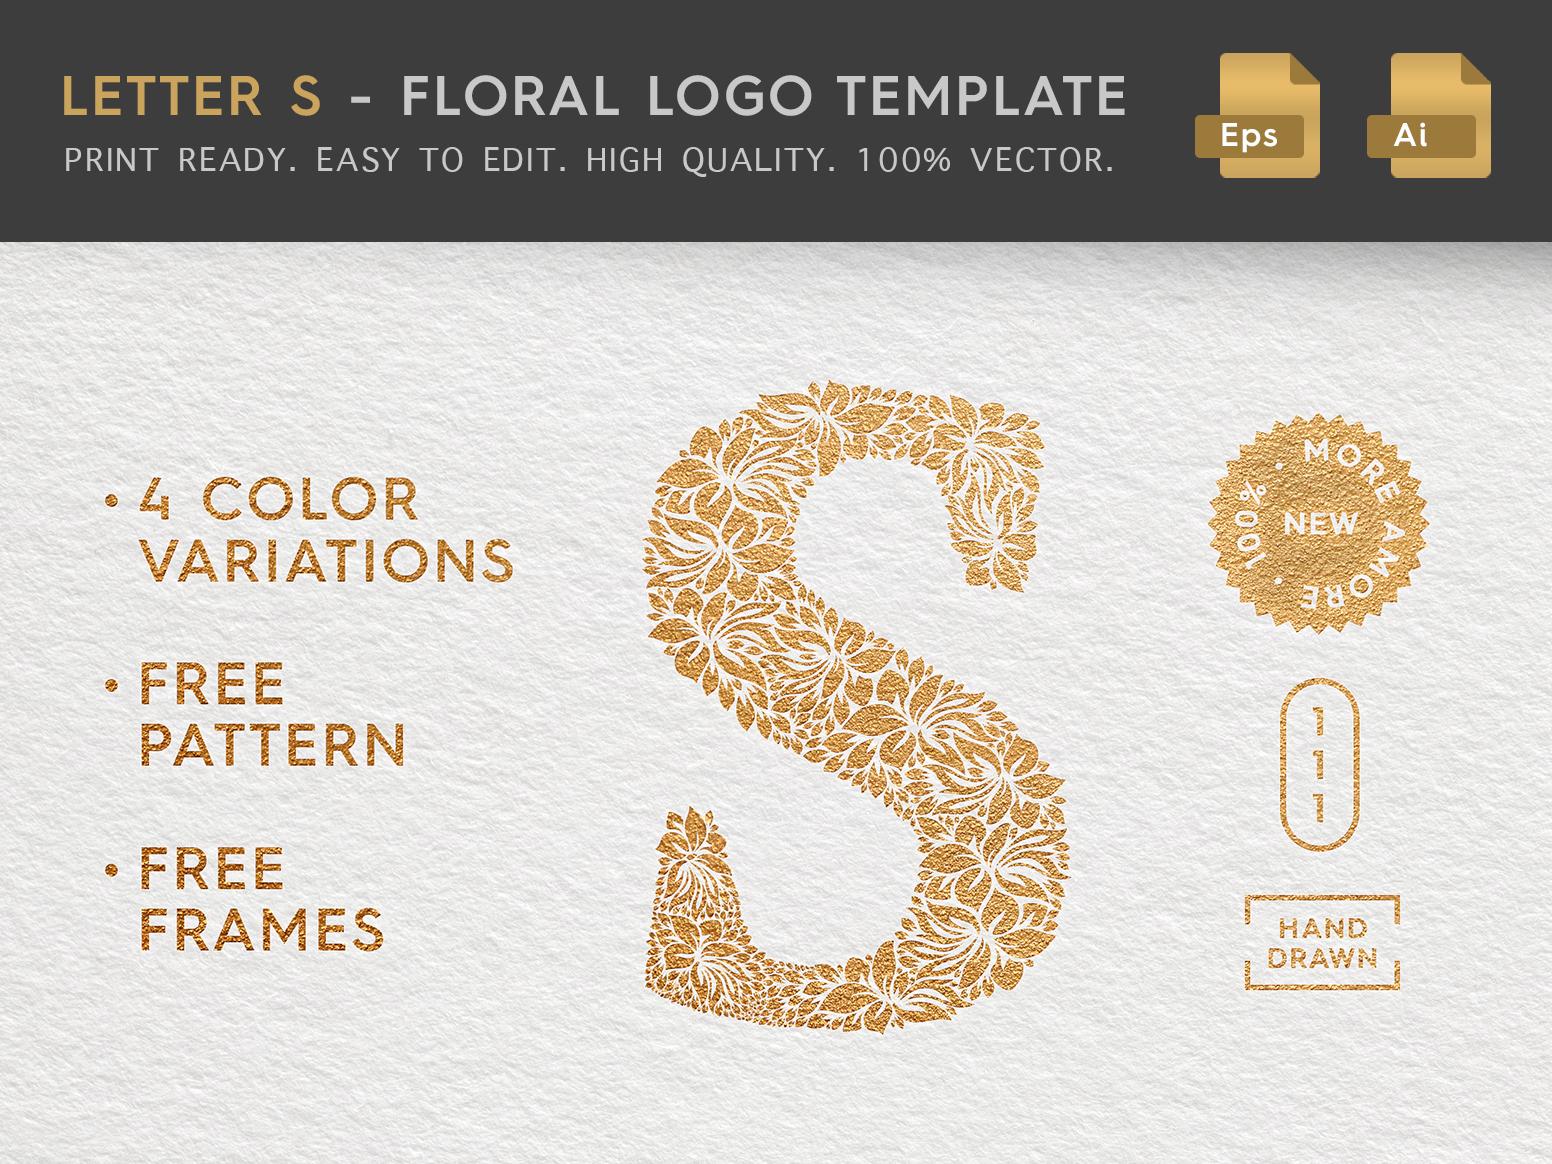 Floral Letter S Logo label beauty logo brand florist hand drawn logo eps logo vector logo delicate hand drawn illustration stationery sign logo template feminine logo female logo logo design floral logo letter logo letter t